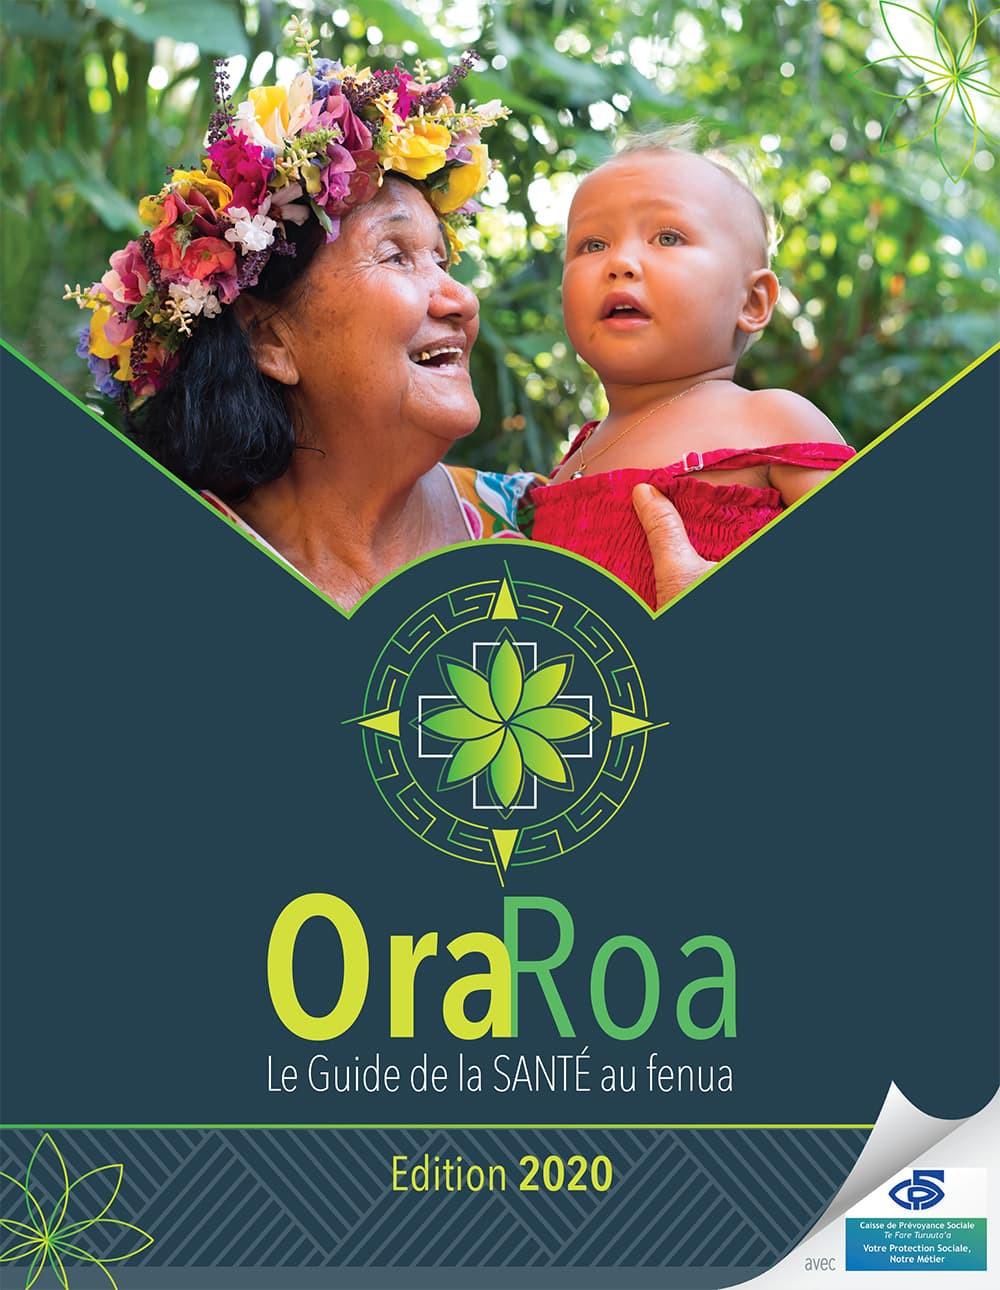 Guide de la santé au fenua OraRoa